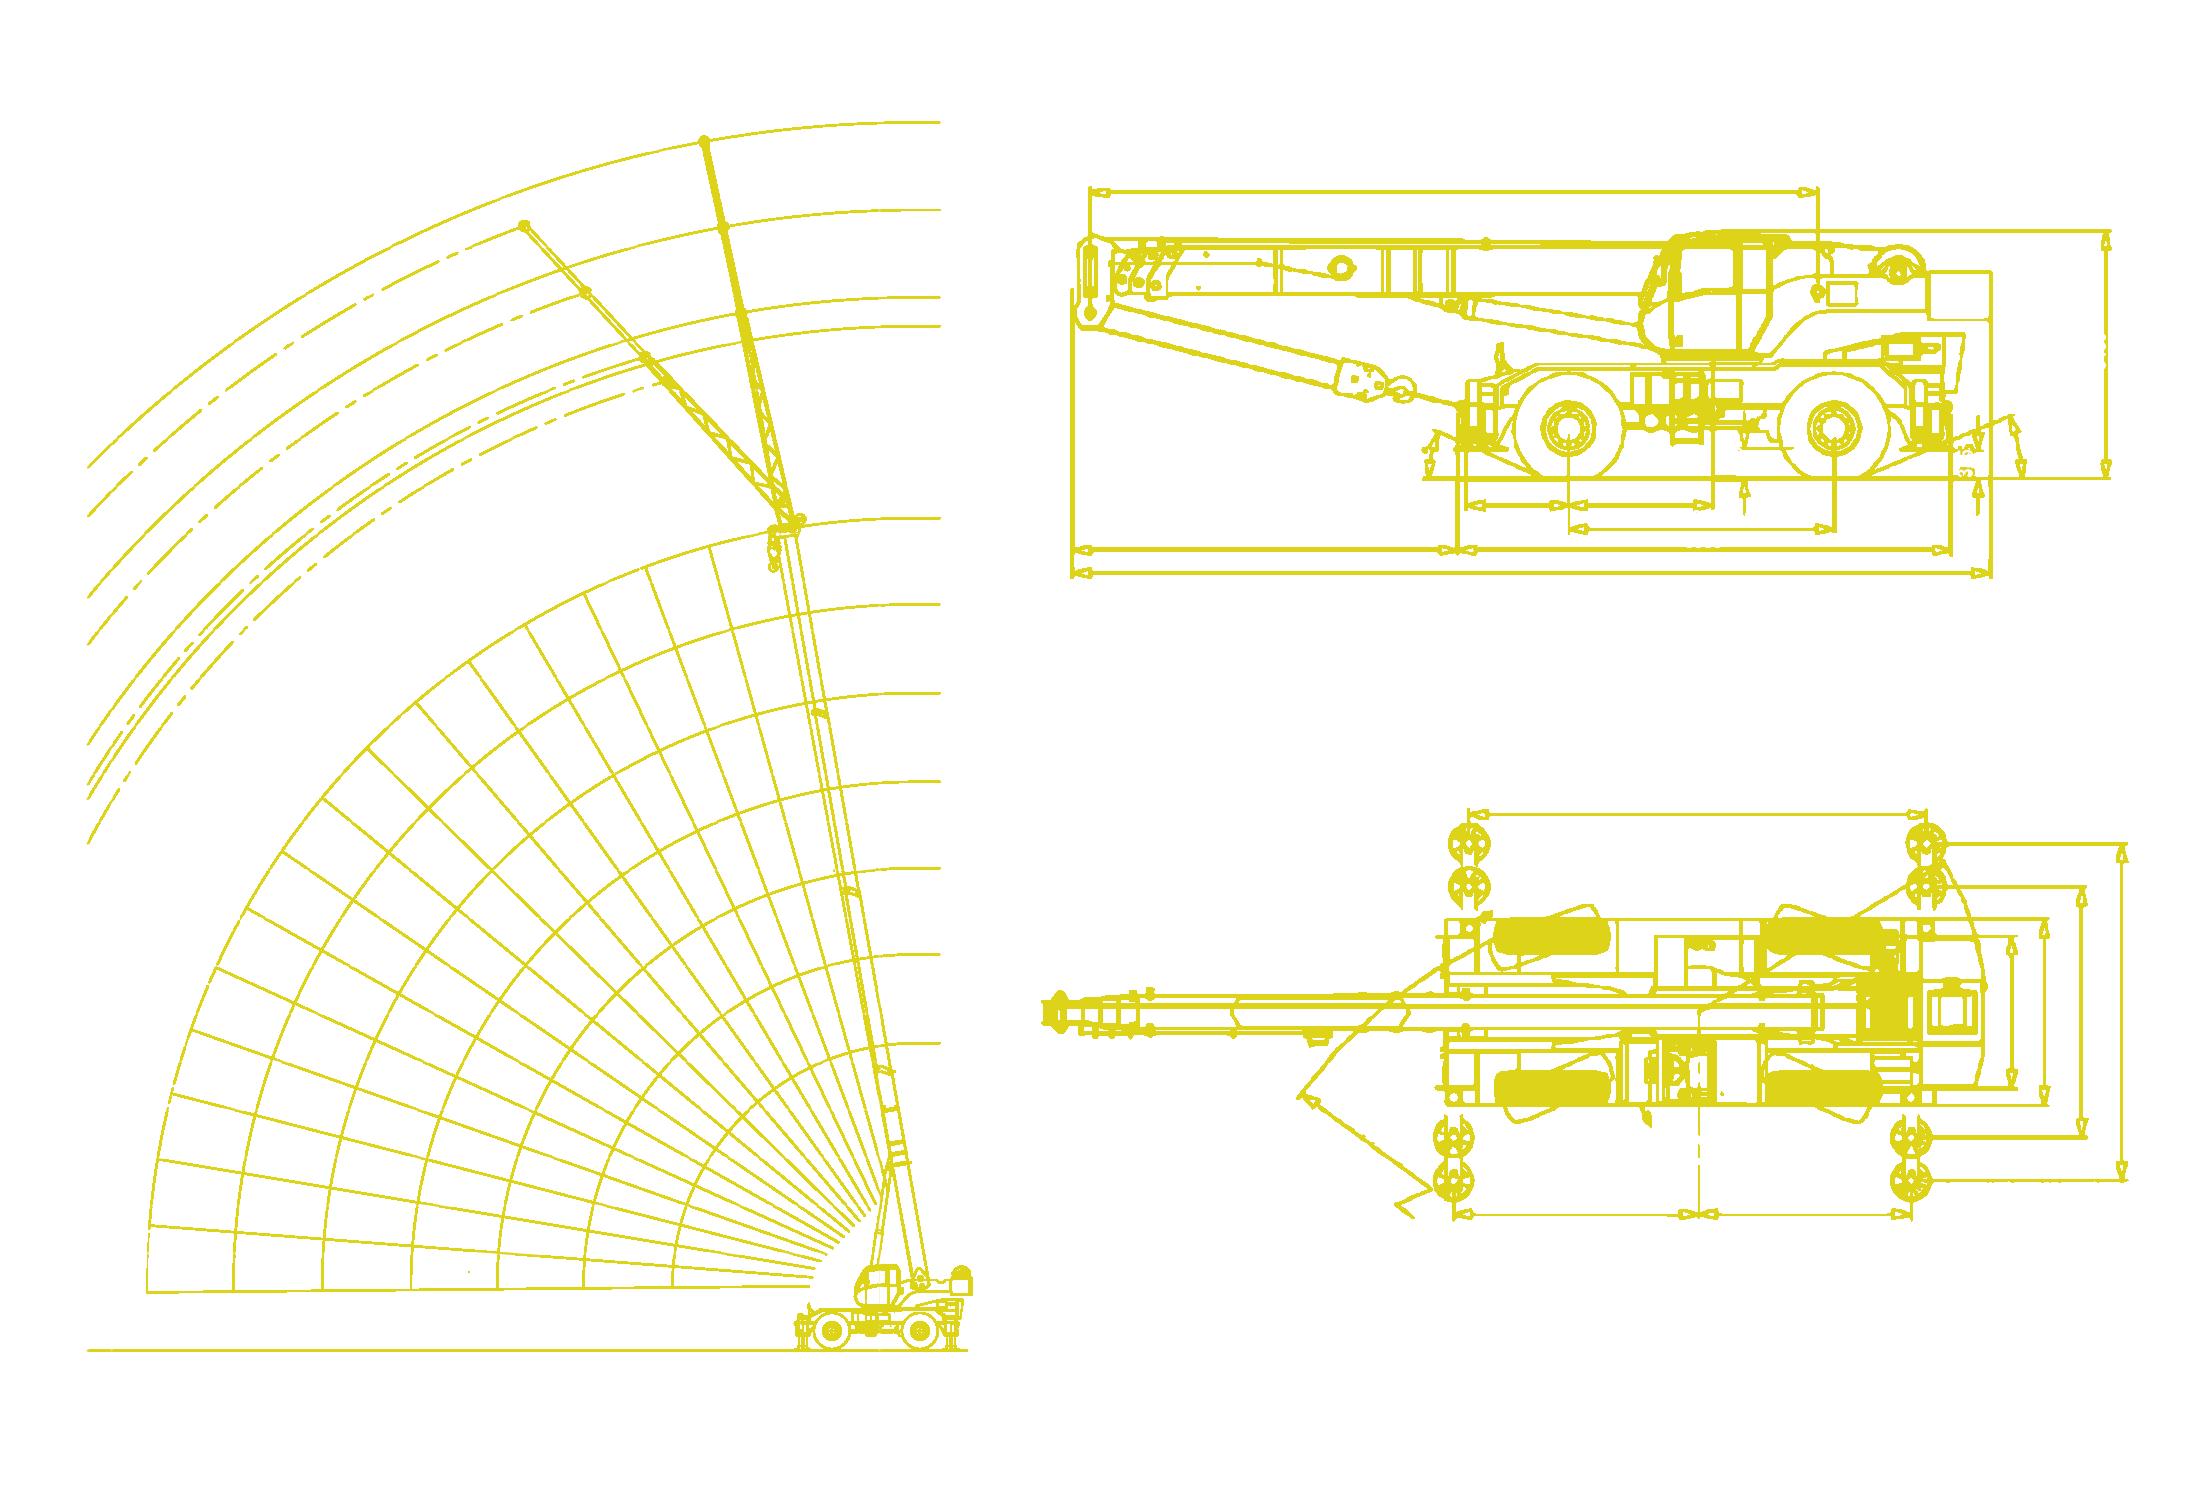 Locatelli - Gril 50.45 Working Envelope and Machine Diagrams